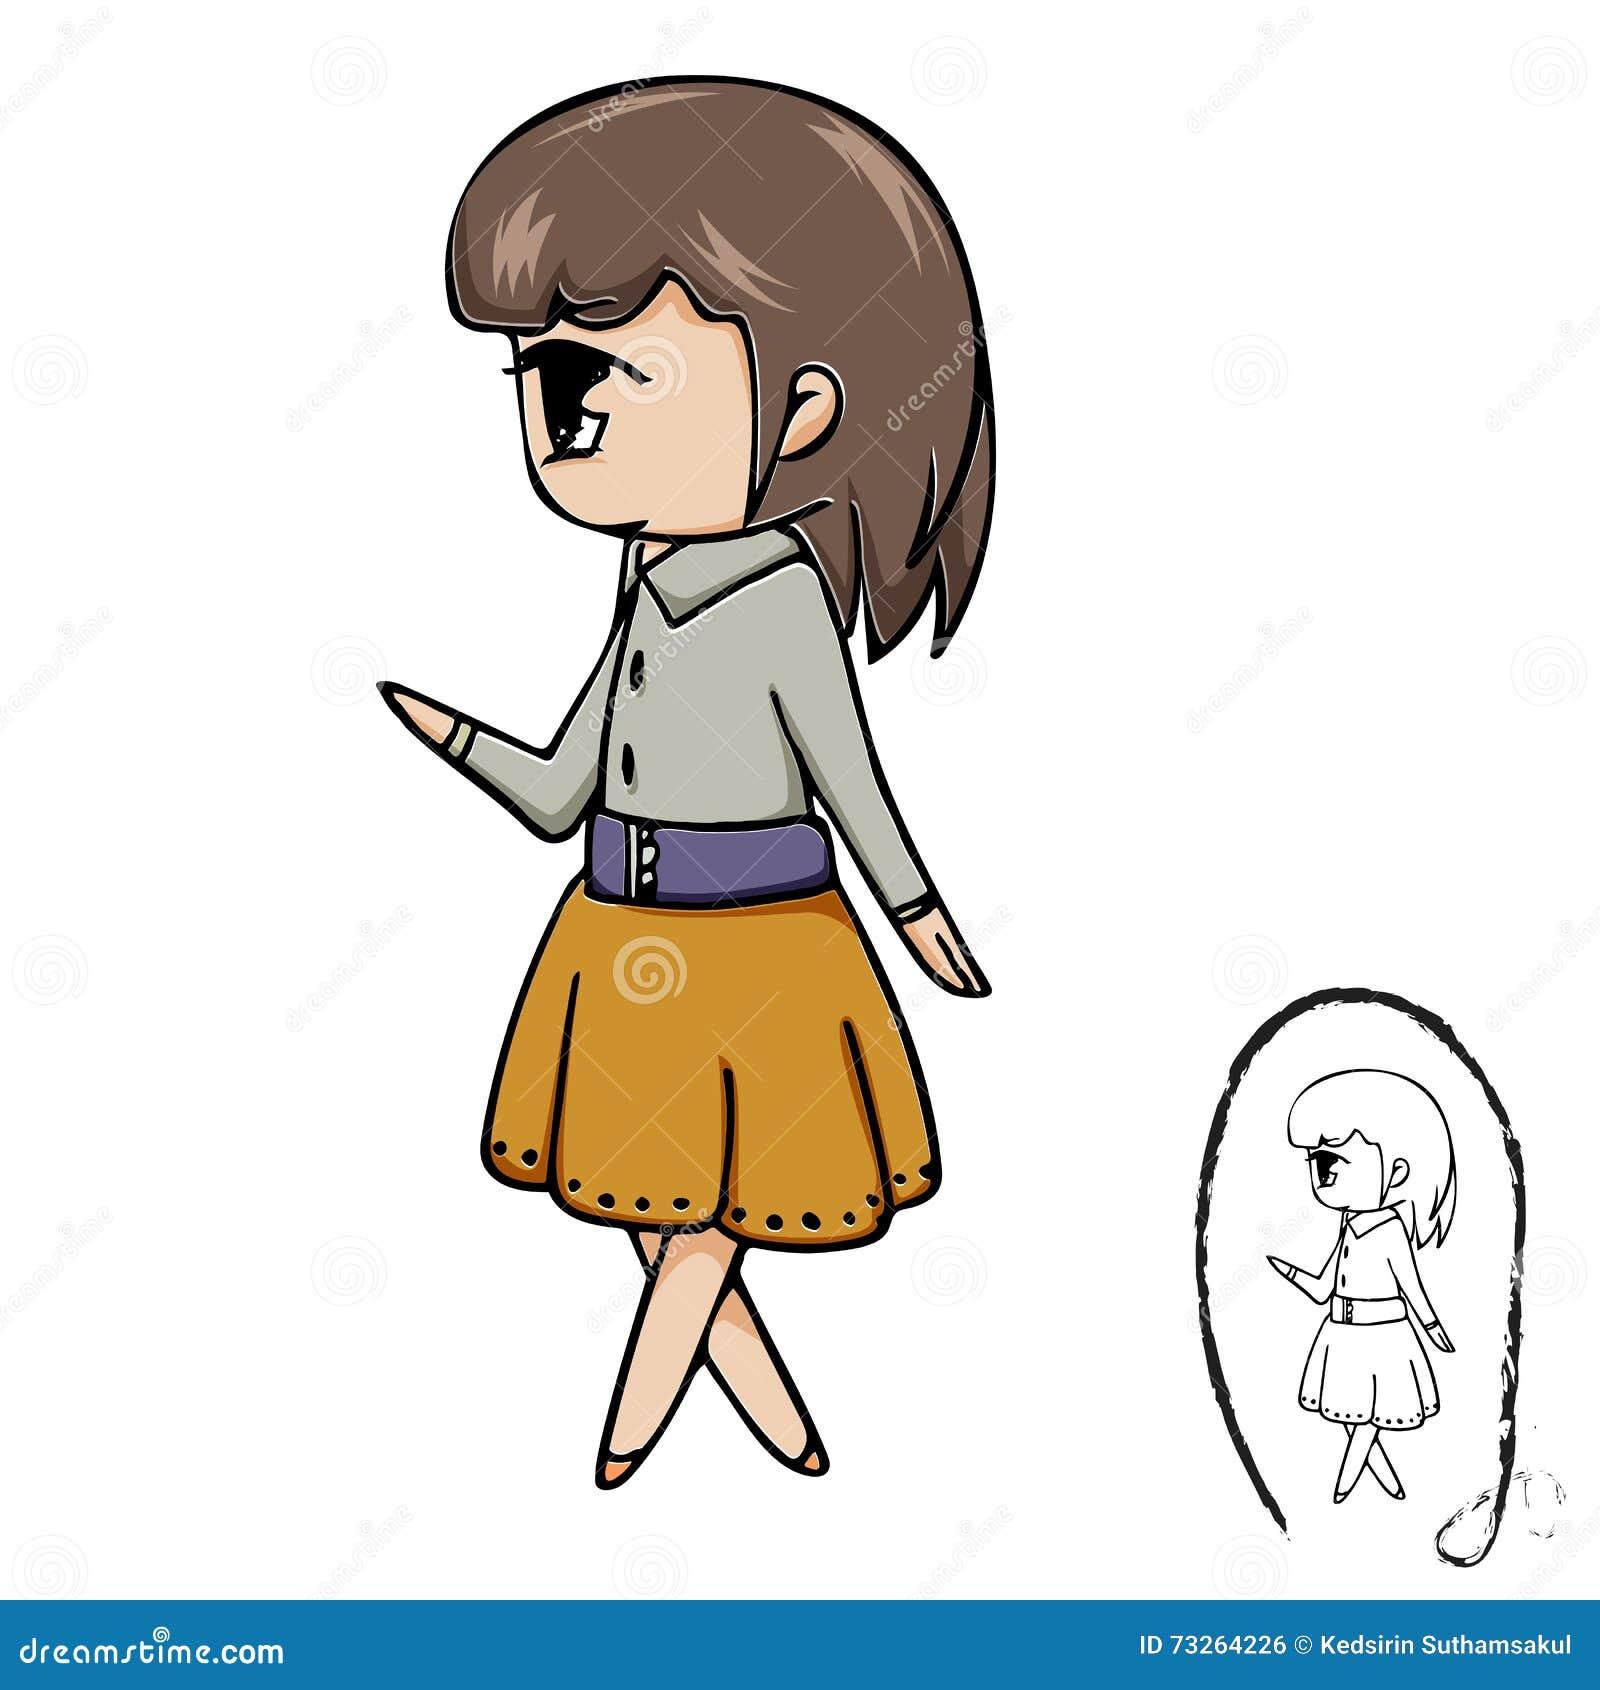 Line Drawing Cartoon : Woman face cartoon sketch in black line doodle vector